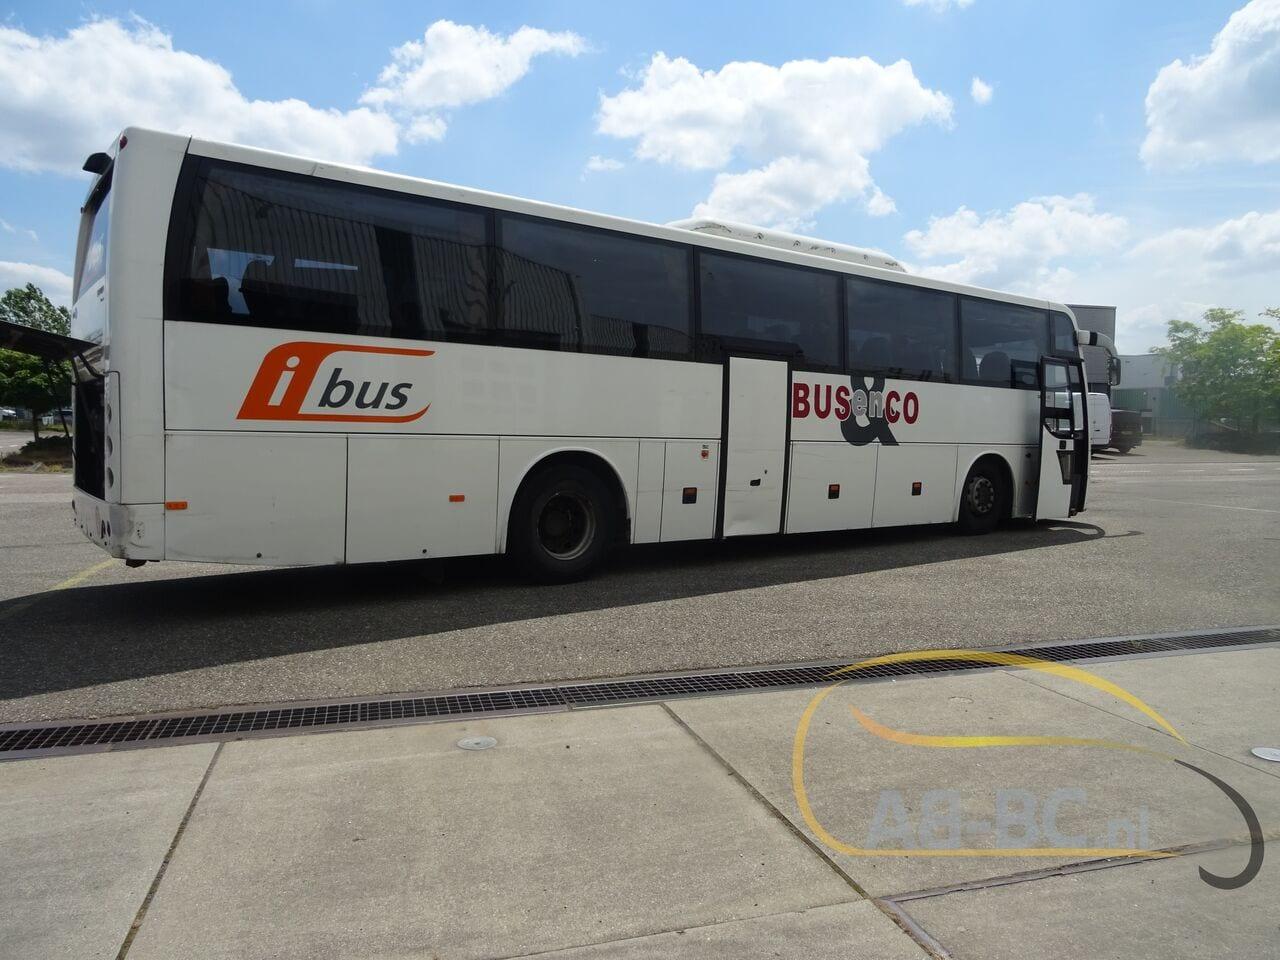 coach-busTEMSA-Safari-RD-DAF-Motor-53-Seats-Euro-5---1623932789838282352_big_9f18ba54360a5f866ba690ef581a0b9a--21061715155620919600